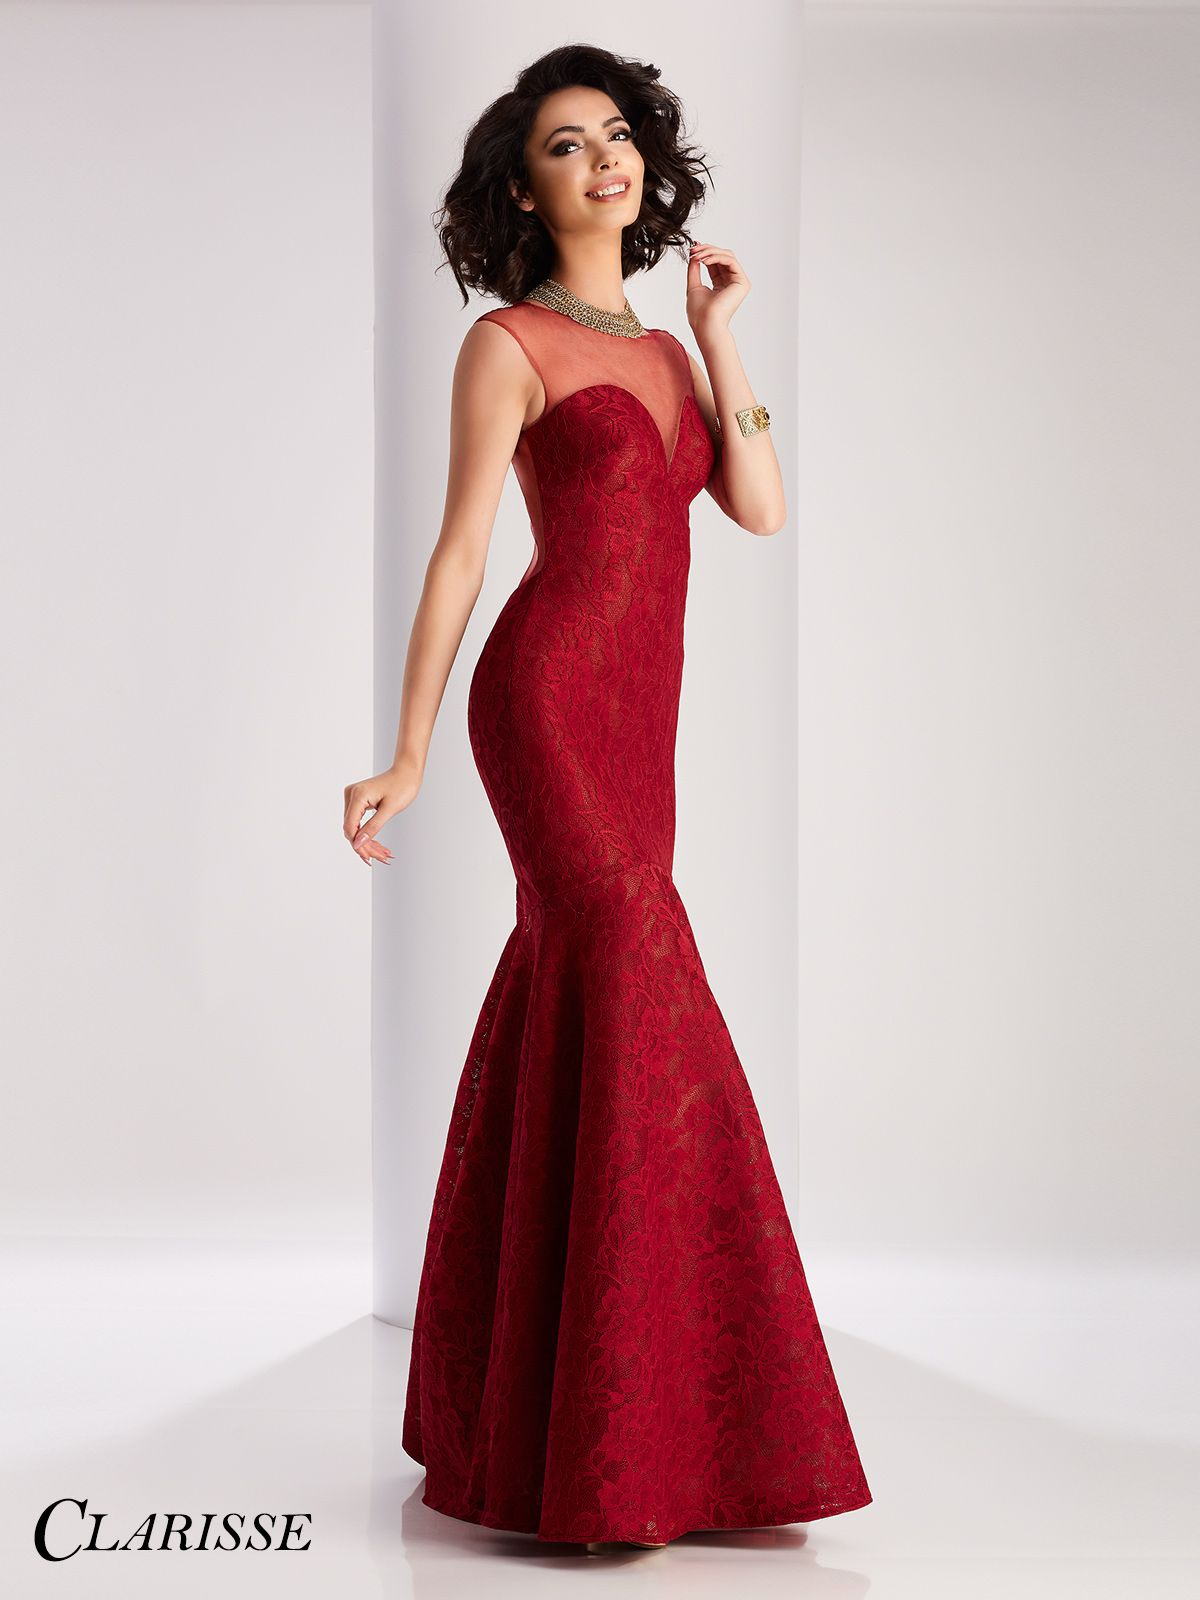 Wedding Prom Dresses Mermaid clarisse mermaid two piece prom dress 4808 mermaids the ojays lace 3061